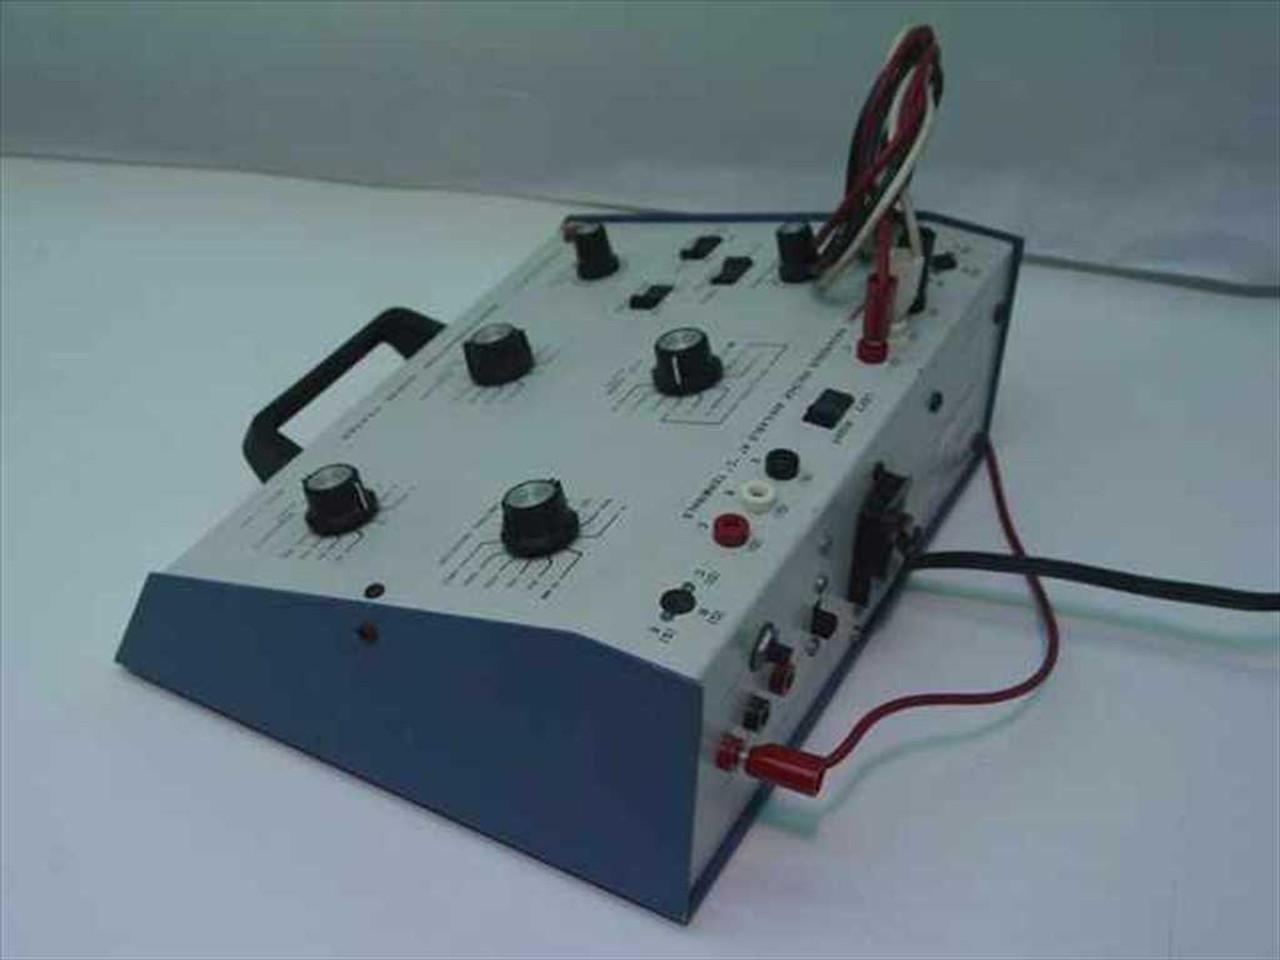 Heathkit IT-3121 Semiconductor Curve Tracer